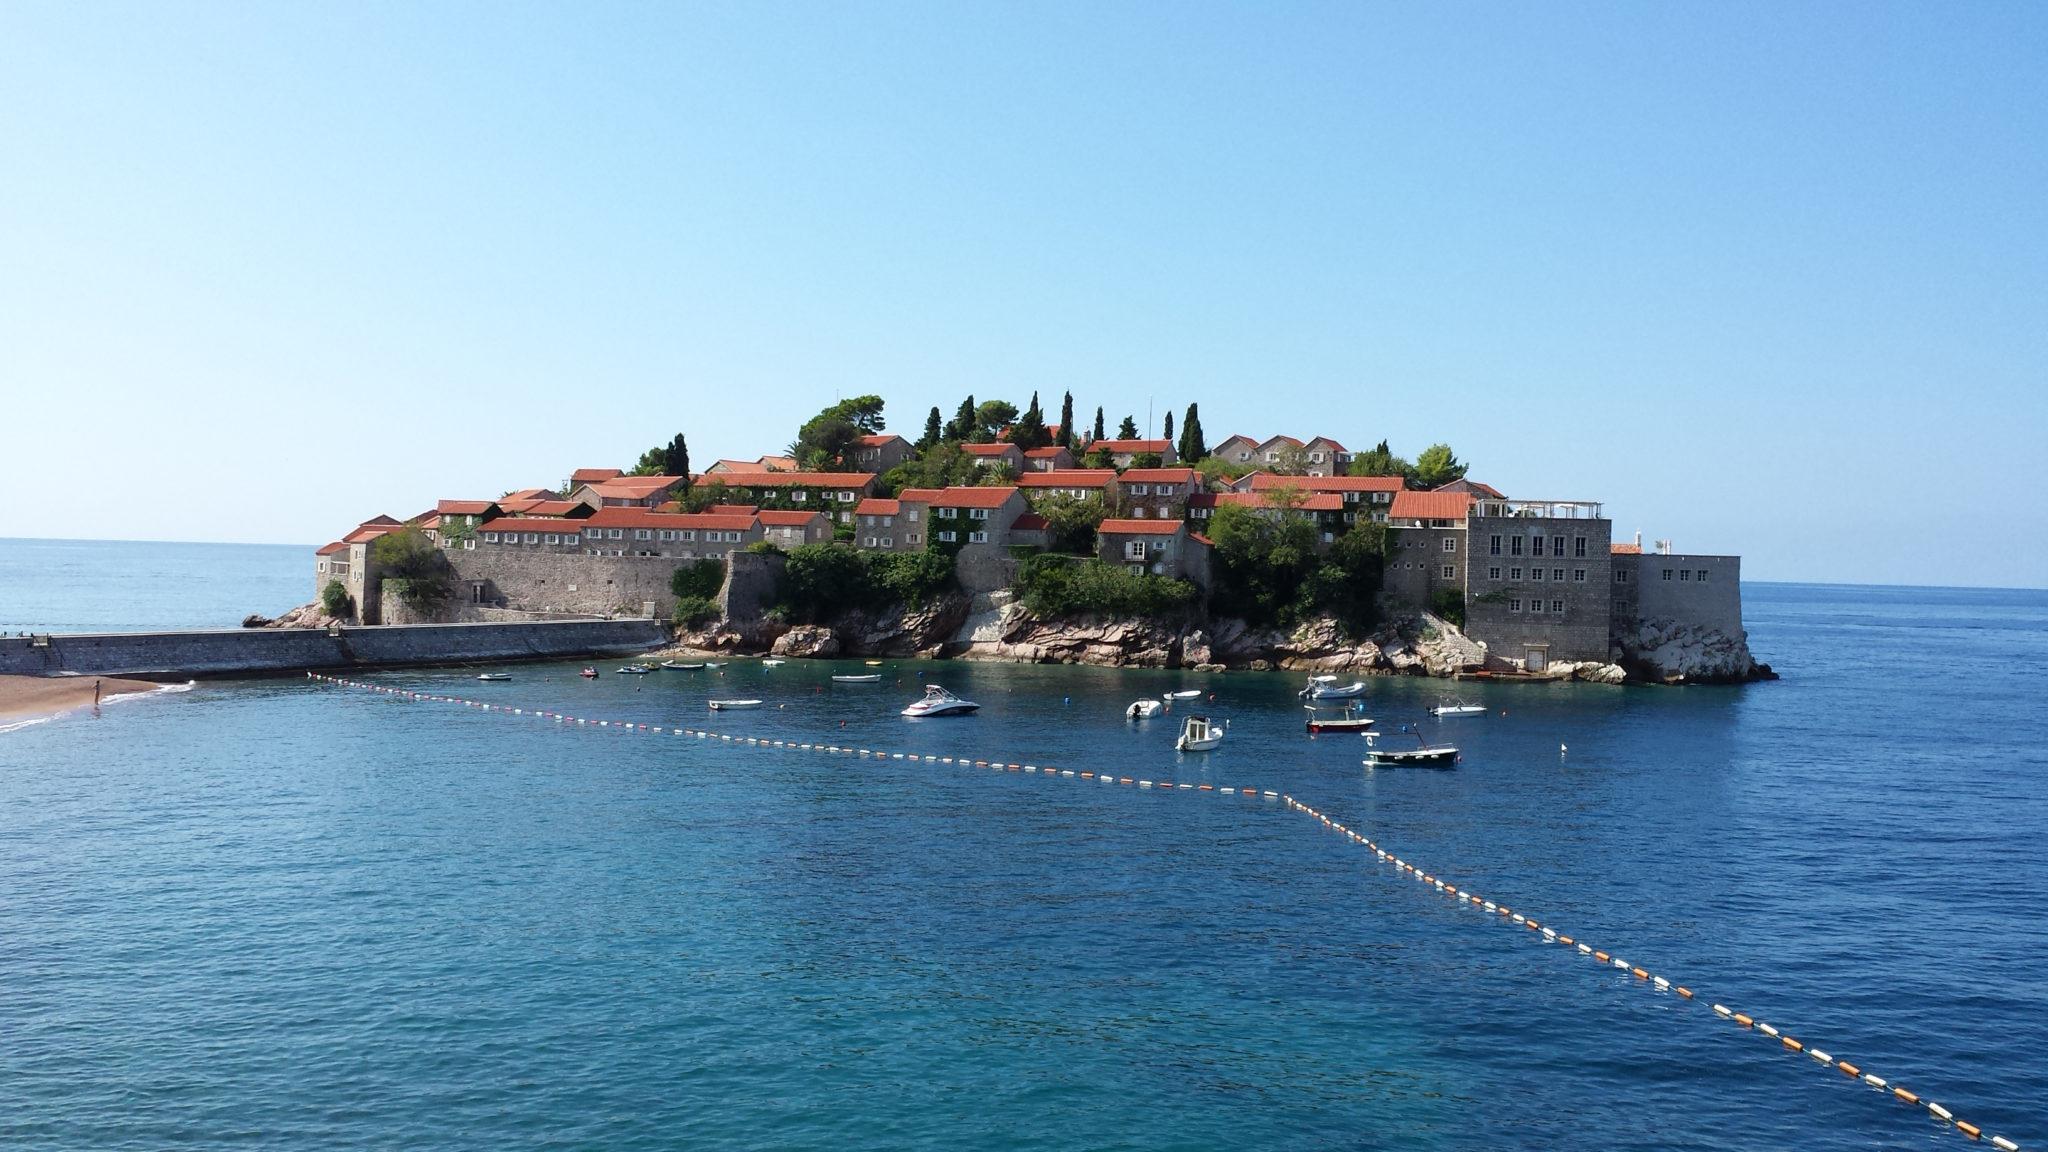 Hema_Montenegro_Sveti_Stefan_privat_beach_Adriatic_Coast_Blog_Voyage_Travel10